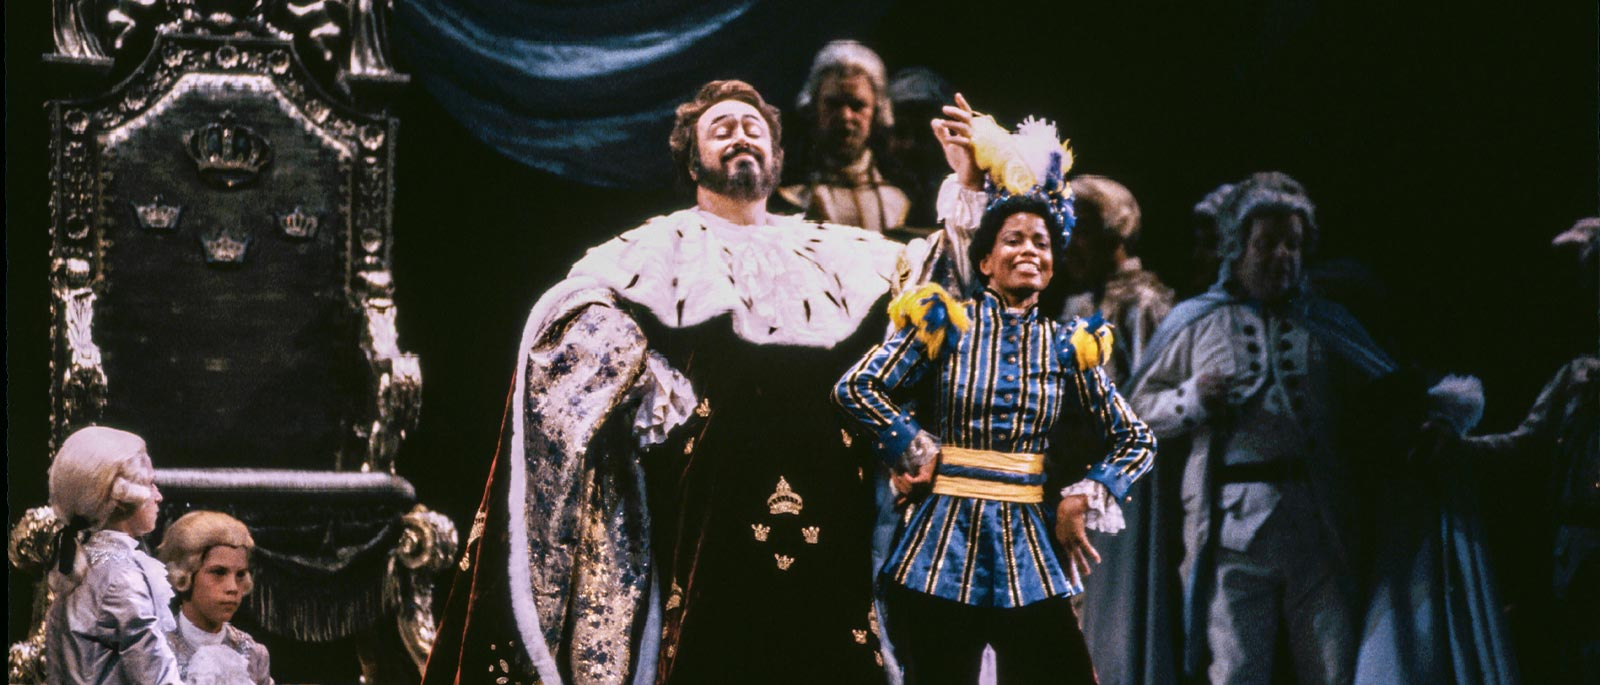 Pavarotti Blackwell Un Ballo in Maschera 1600x685.jpg